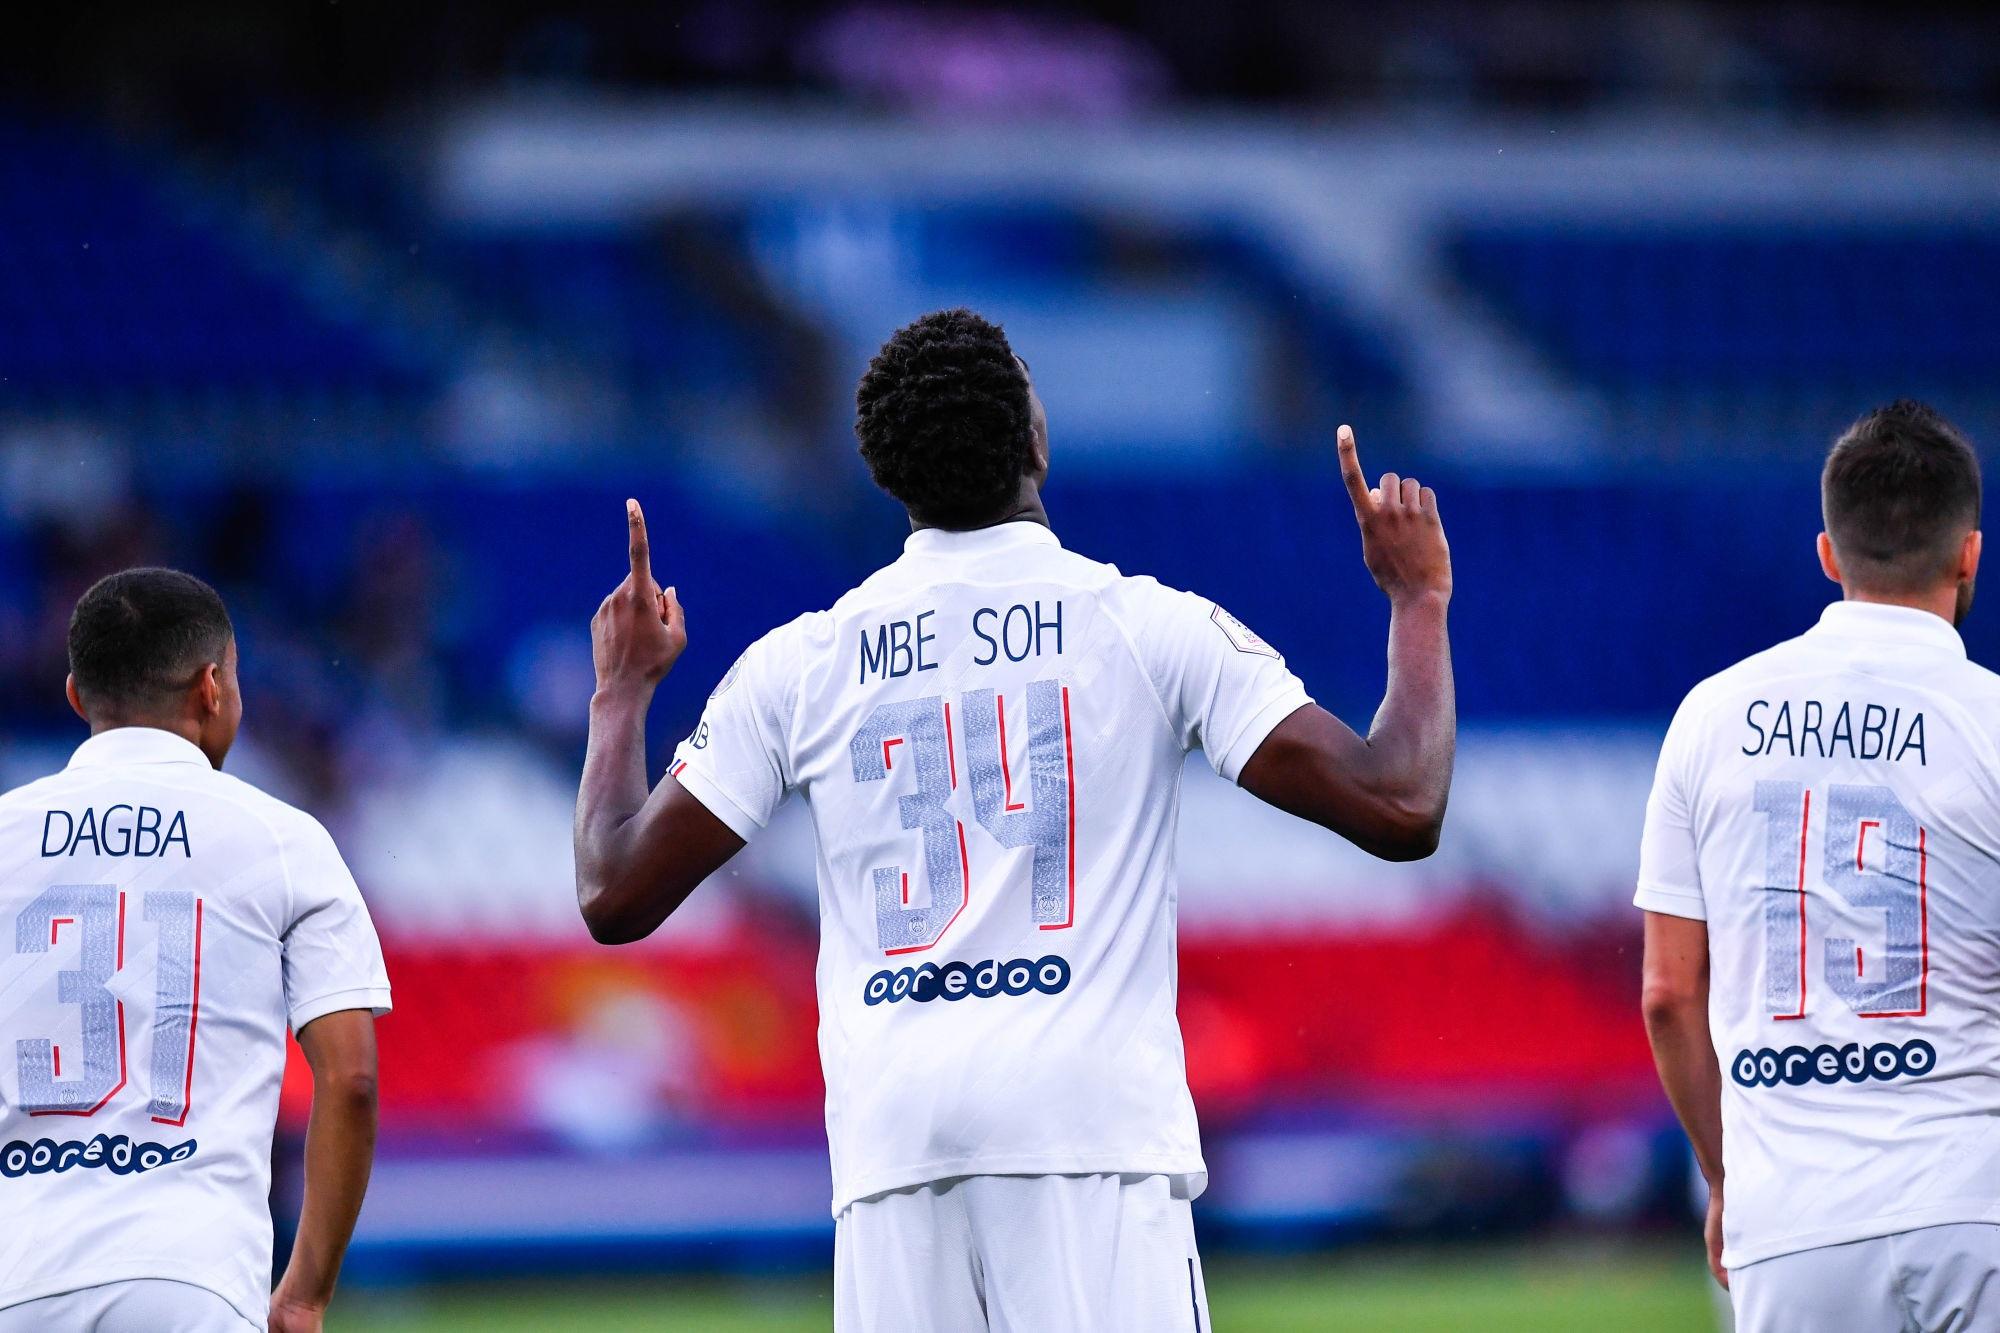 Officiel - Mbe Soh quitte le PSG pour signer à Nottingham Forrest